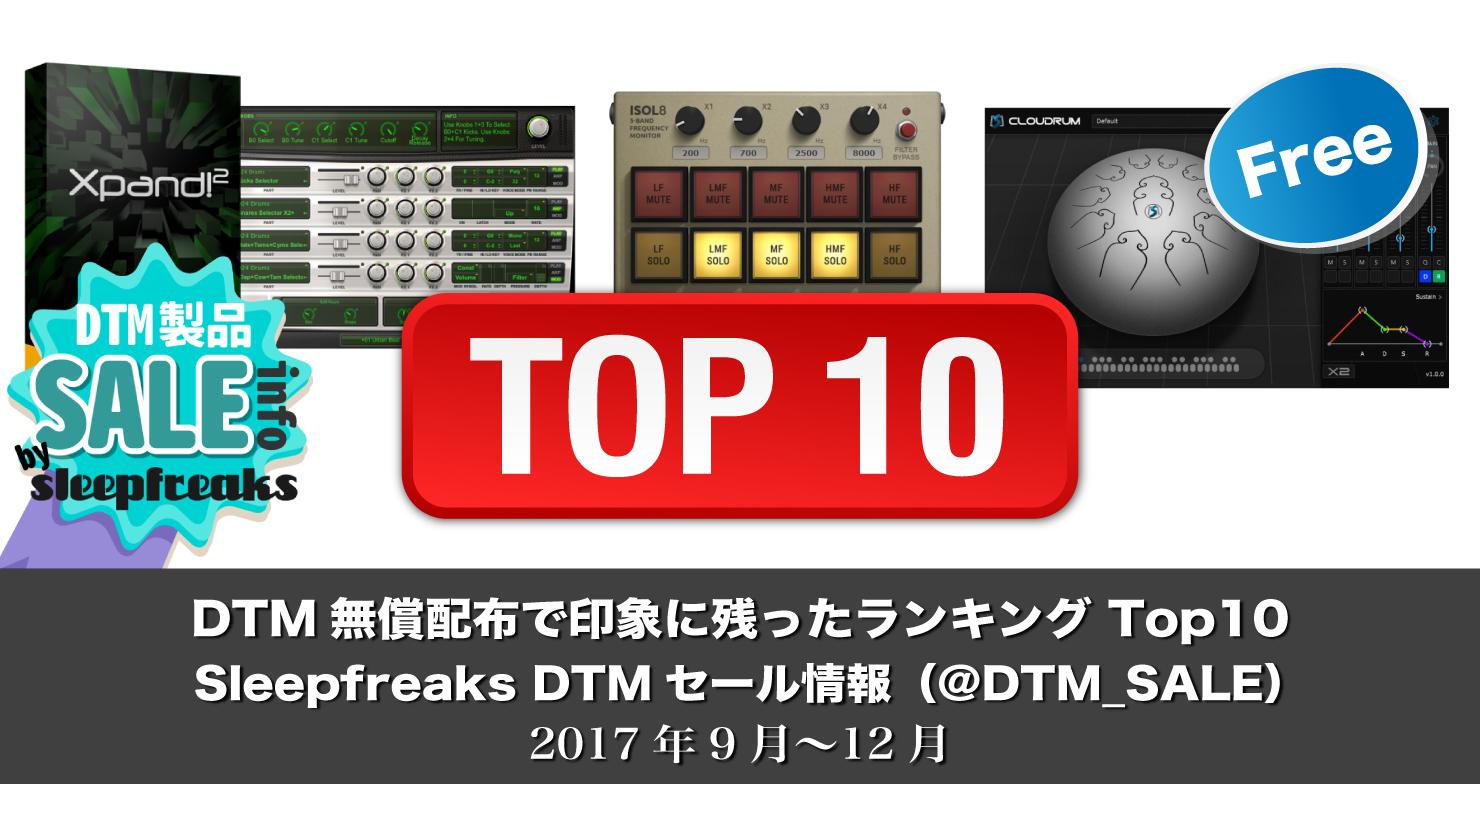 DTM無償配布で印象に残ったランキング Top10(2017年9月〜12月)Sleepfreaks DTMセール情報